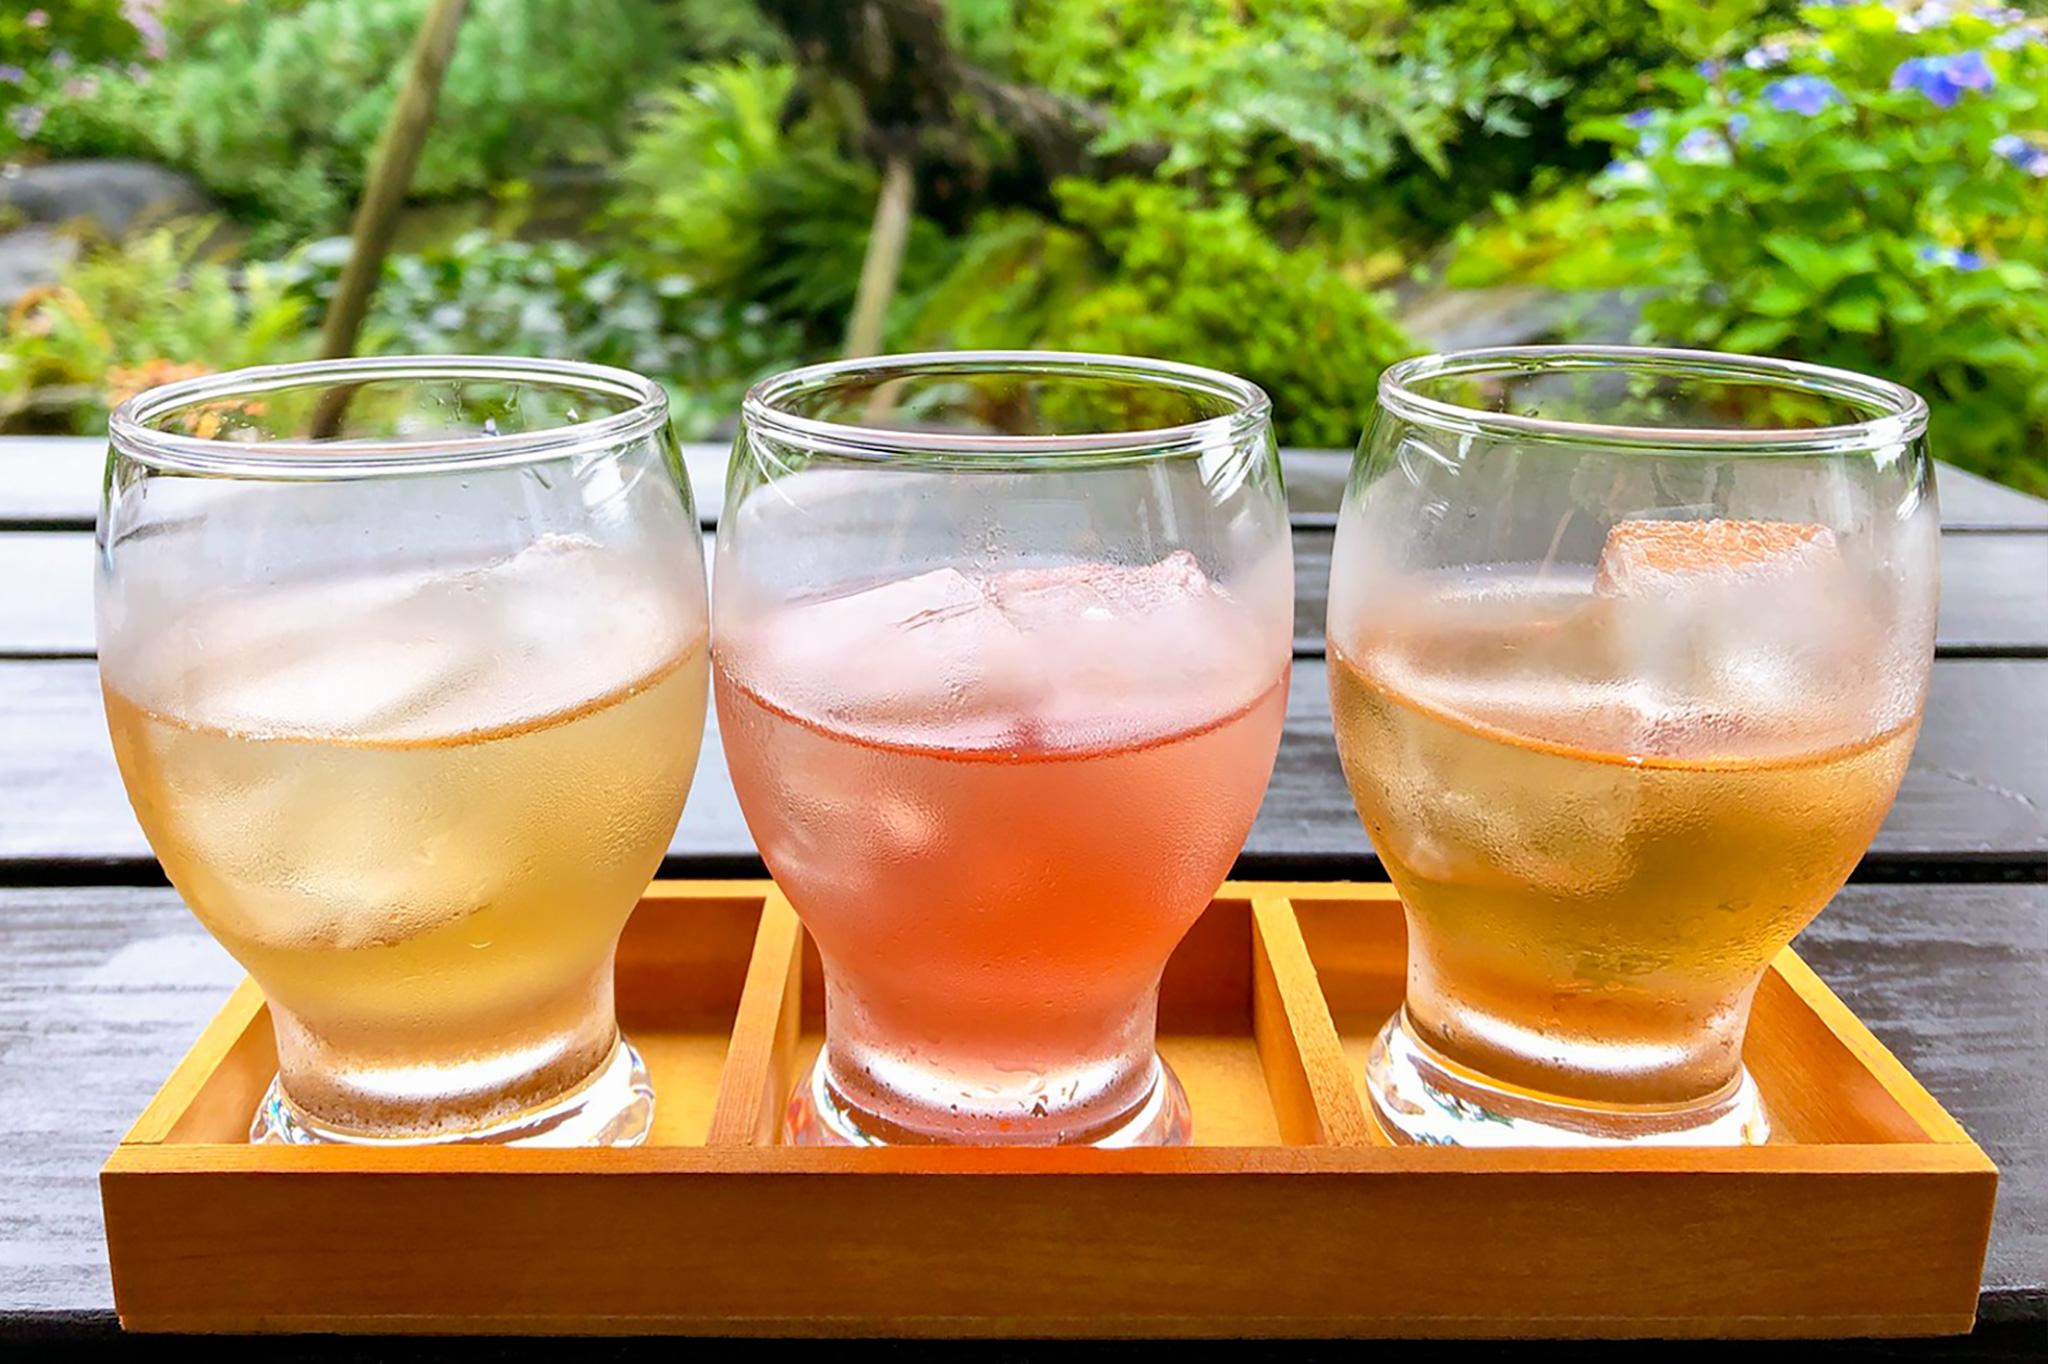 Katsunuma縁側茶房 写真4